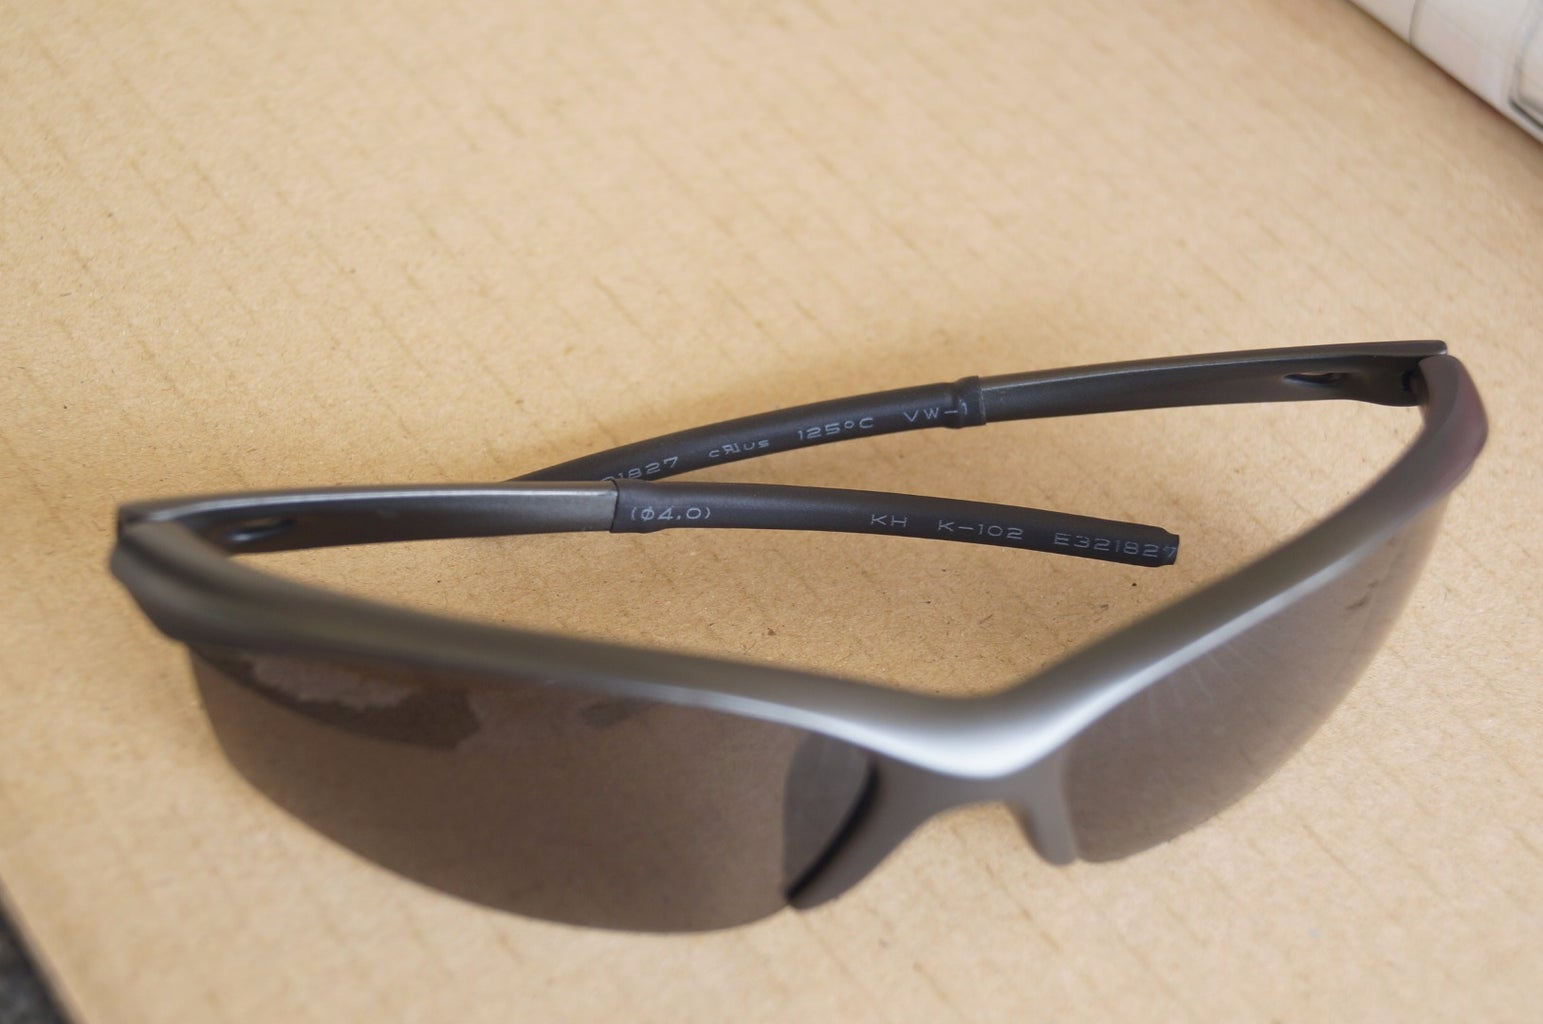 Heat Shrink Tube Replace Sunglasses Temple Tips